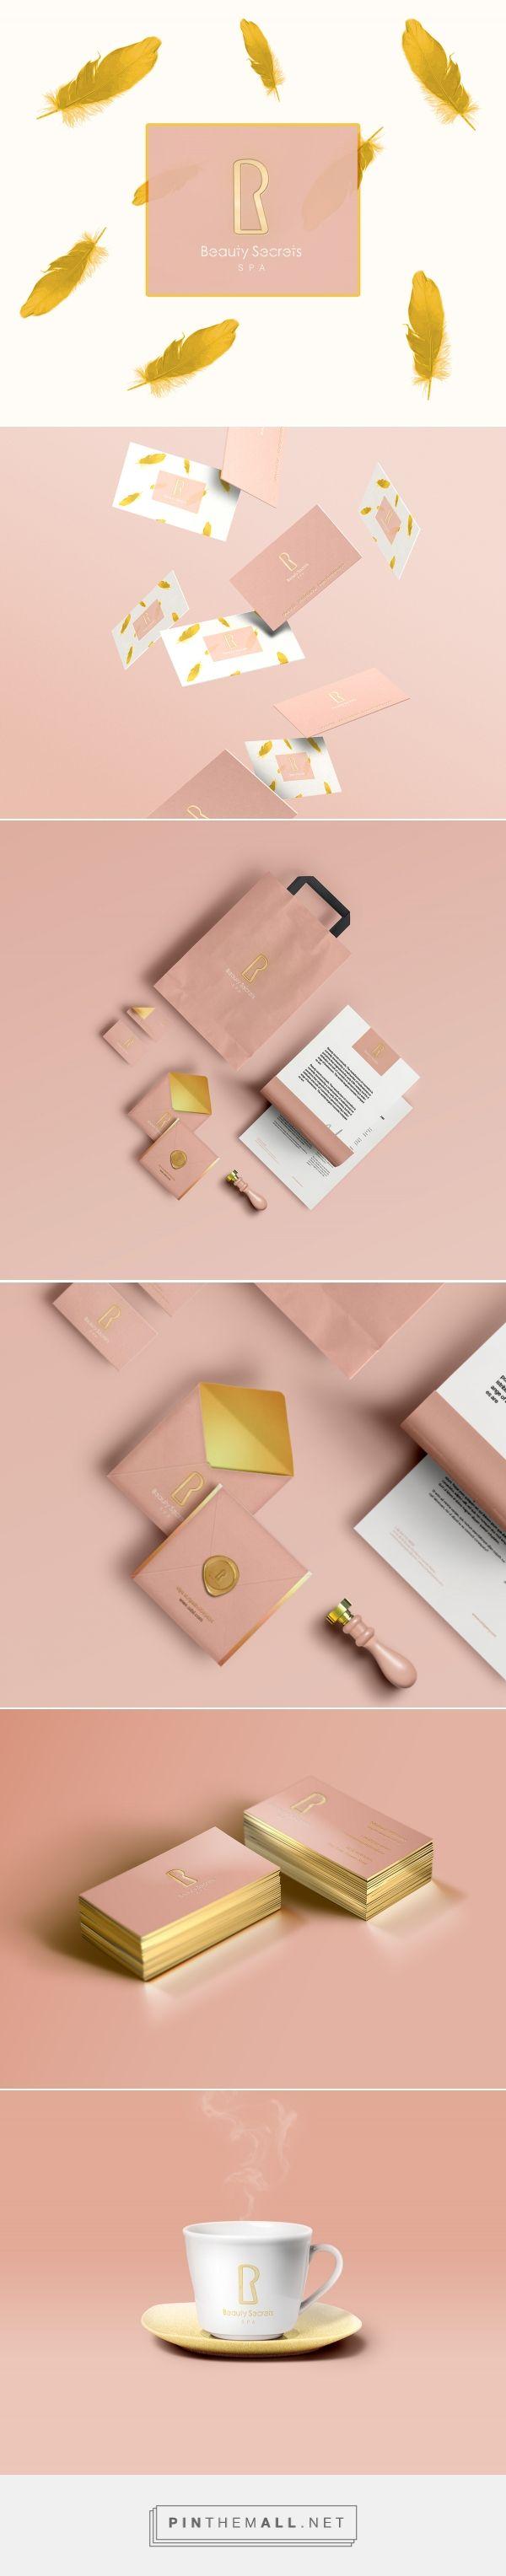 Beauty Secret Branding by Layan Ibrahim | Fivestar Branding Agency – Design and Branding Agency & Curated Inspiration Gallery